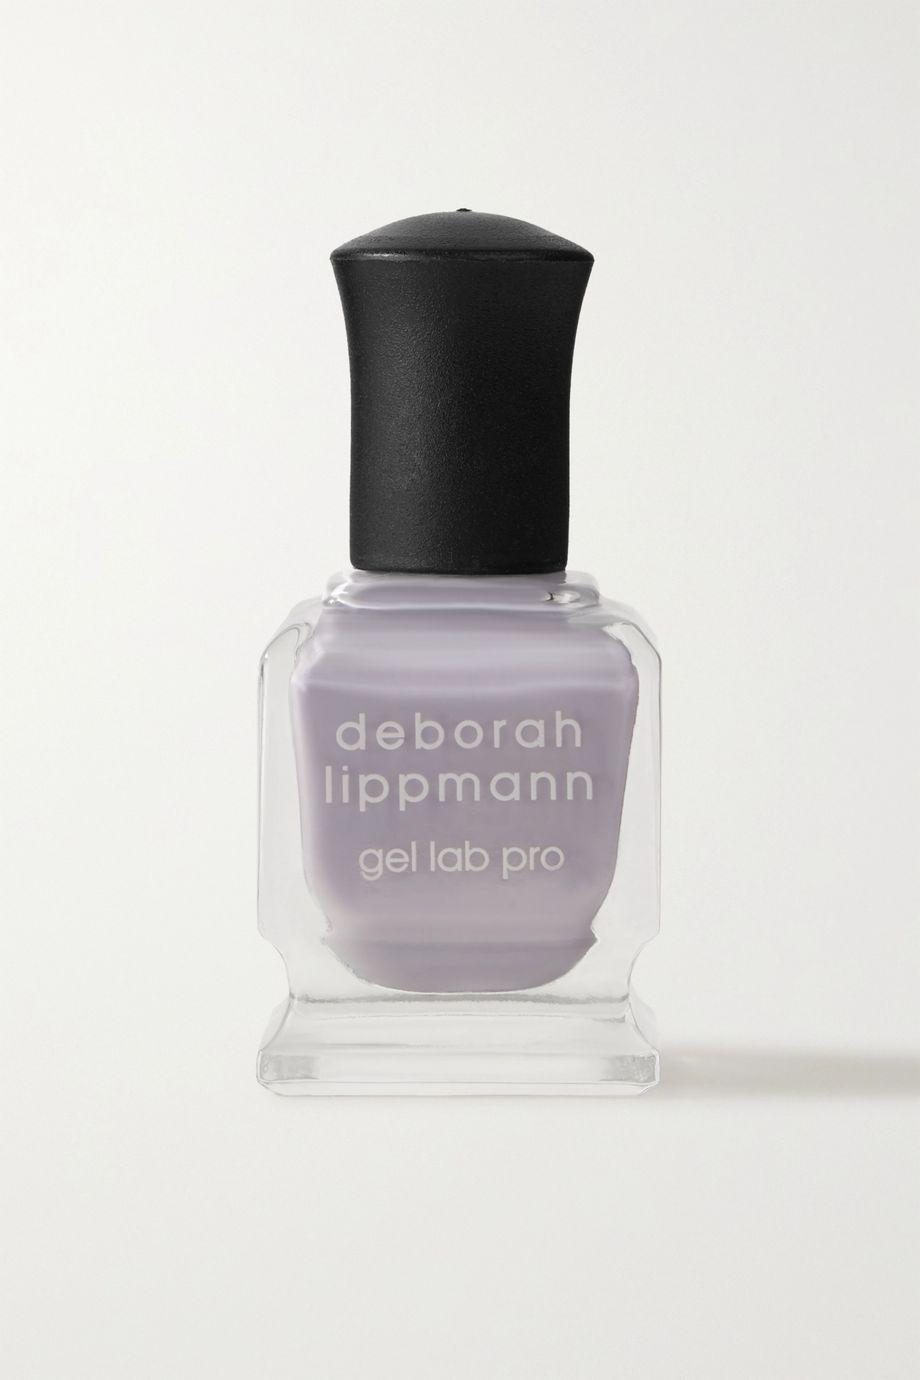 Deborah Lippmann Gel Lab Pro Nail Polish - Call Out My Name